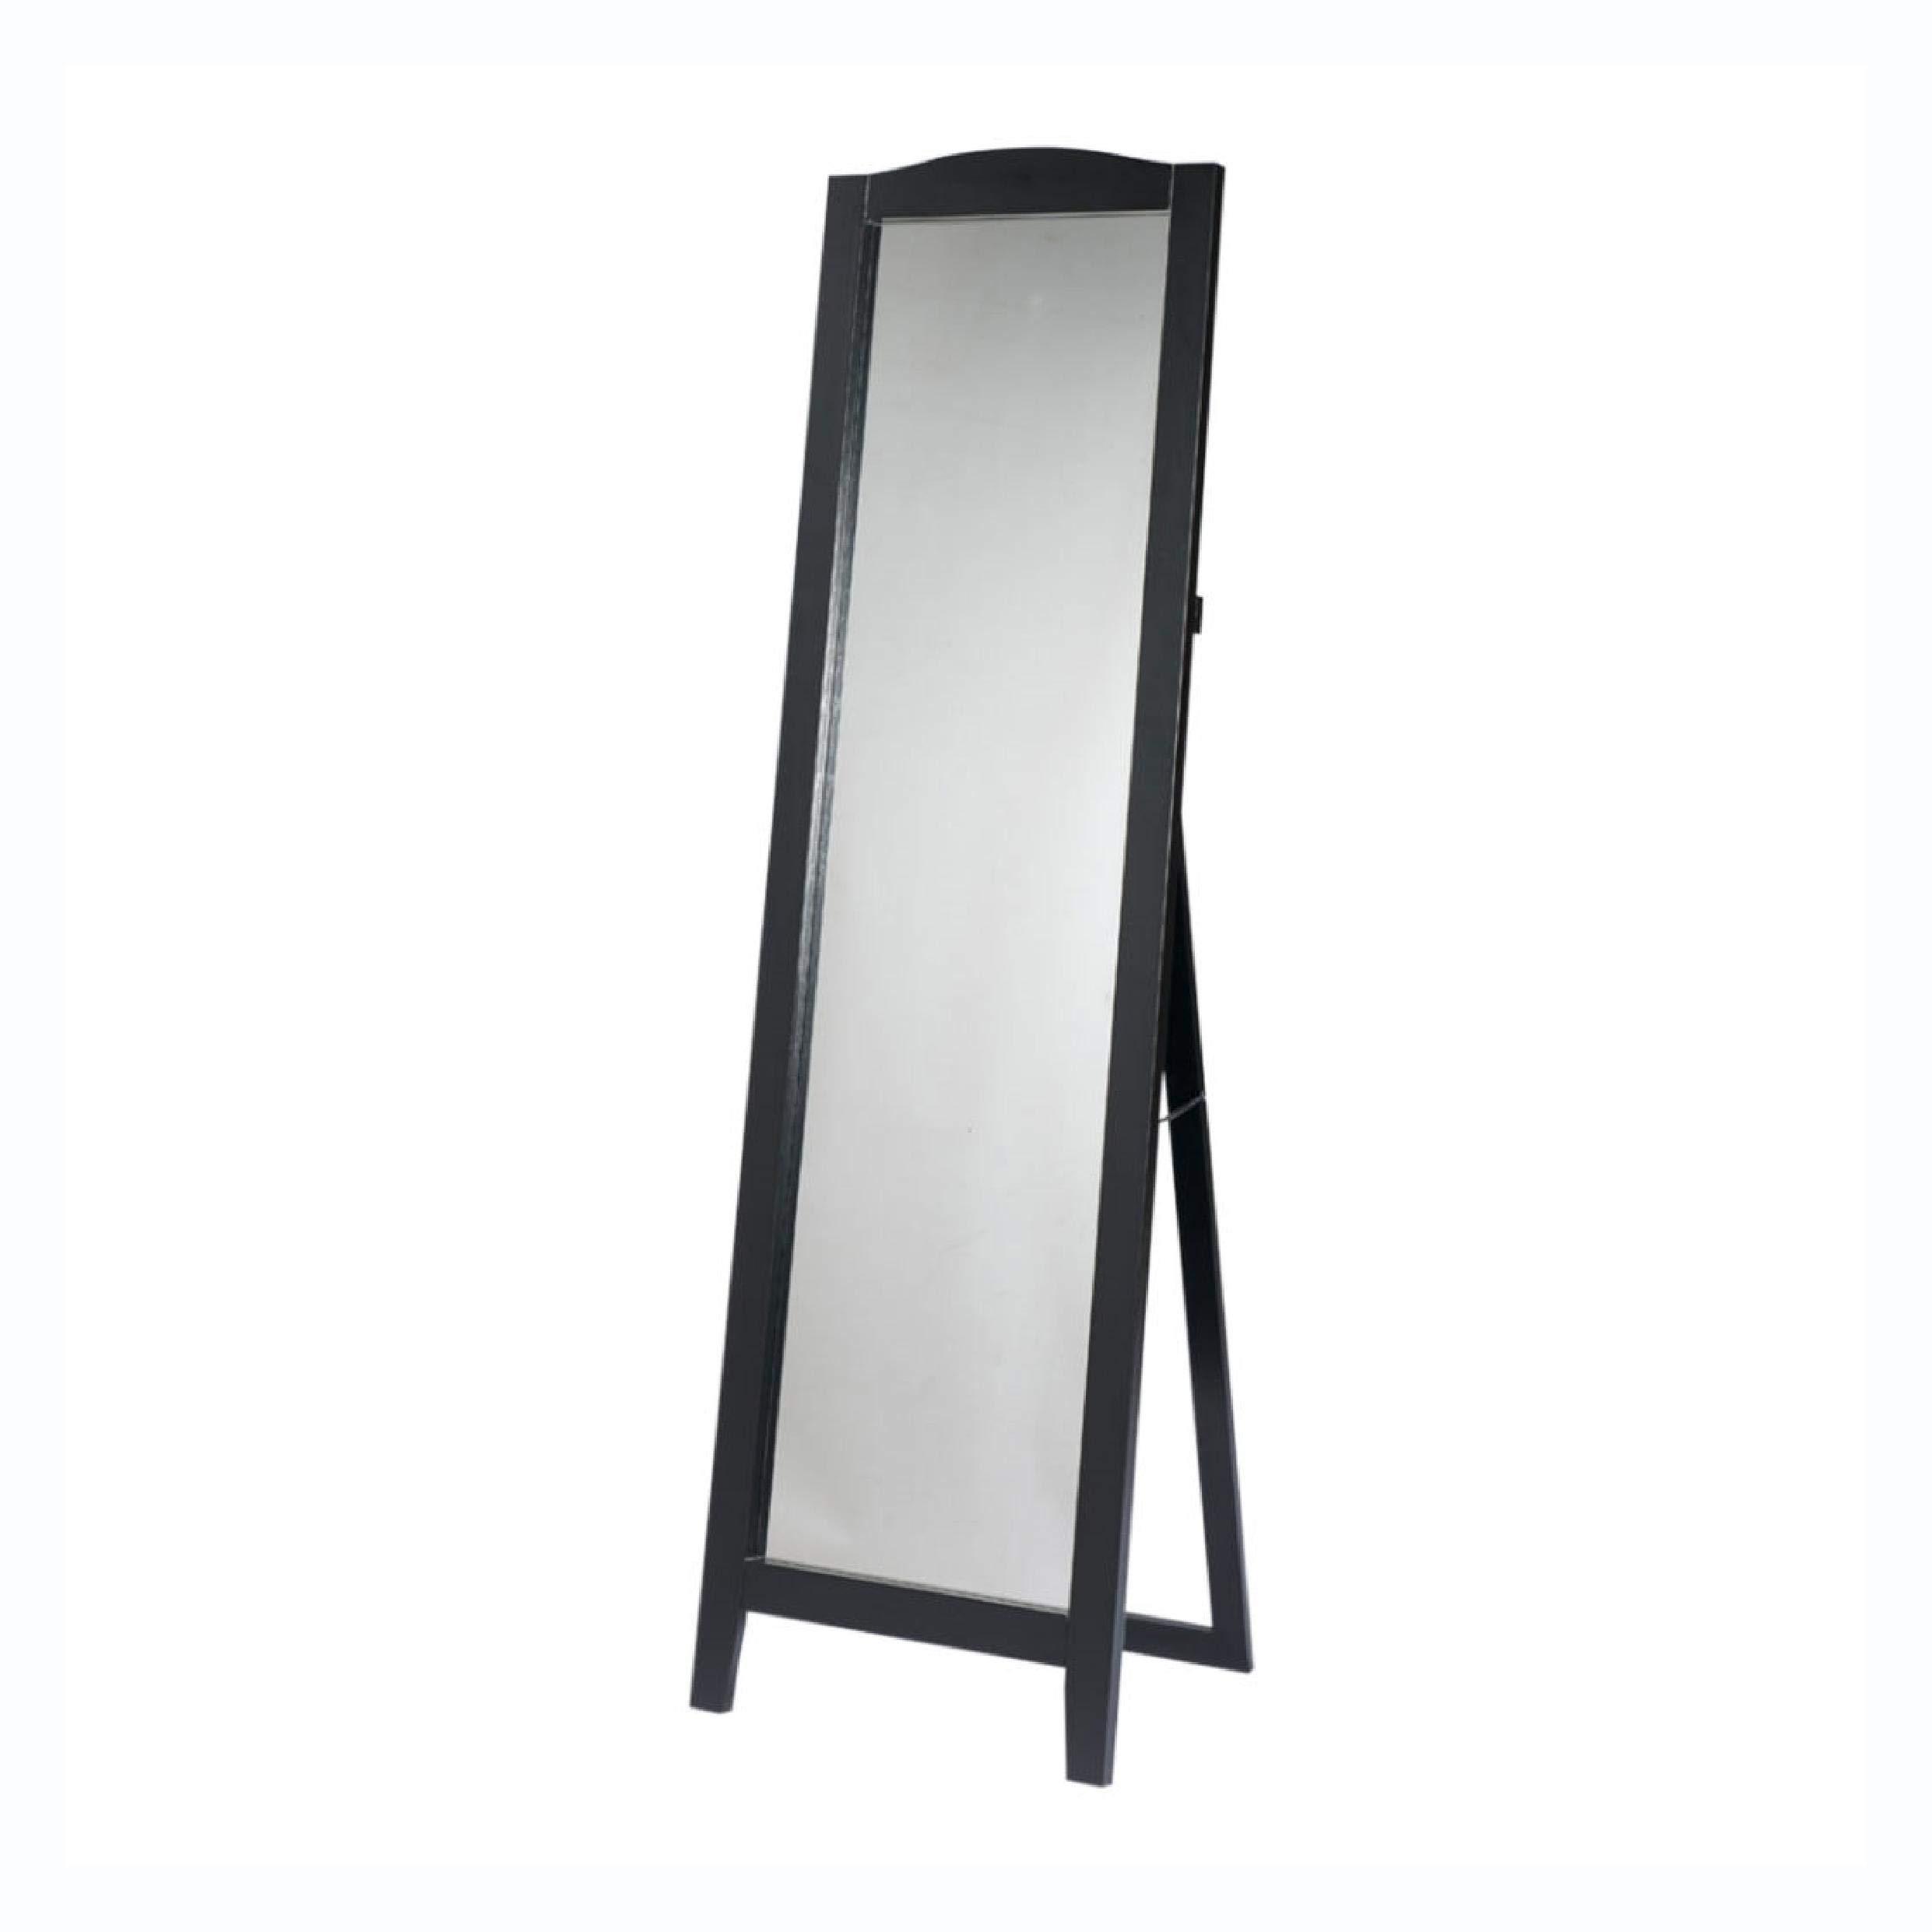 Functional Classic Full Length Leaning Floor Mirror with Black Frame, Functional Classic Full Length Leaning Floor Mirror with Black Frame by HEATAPPLY